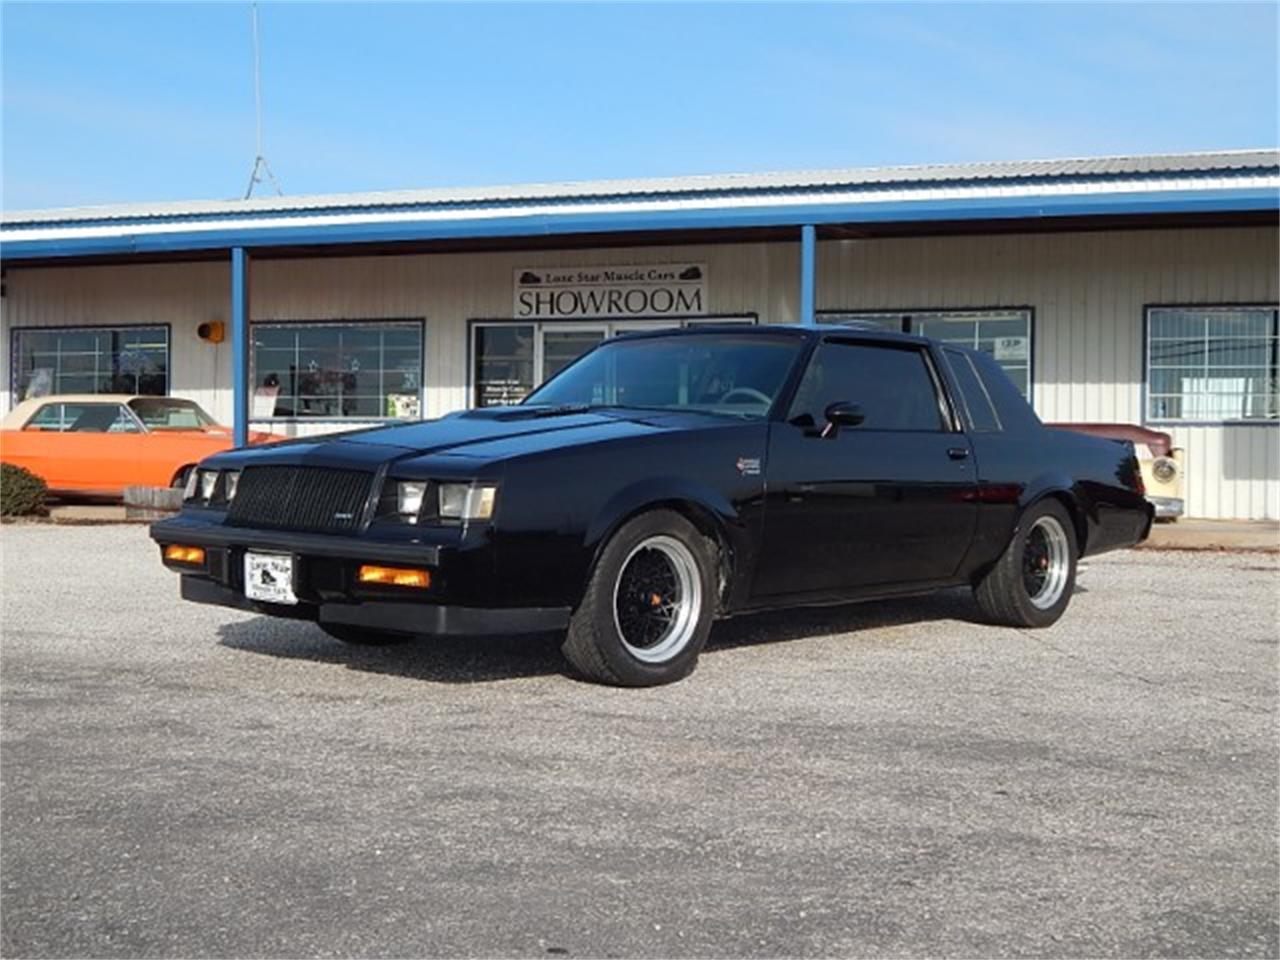 1986 Buick Regal >> 1986 Buick Regal For Sale Classiccars Com Cc 1099788